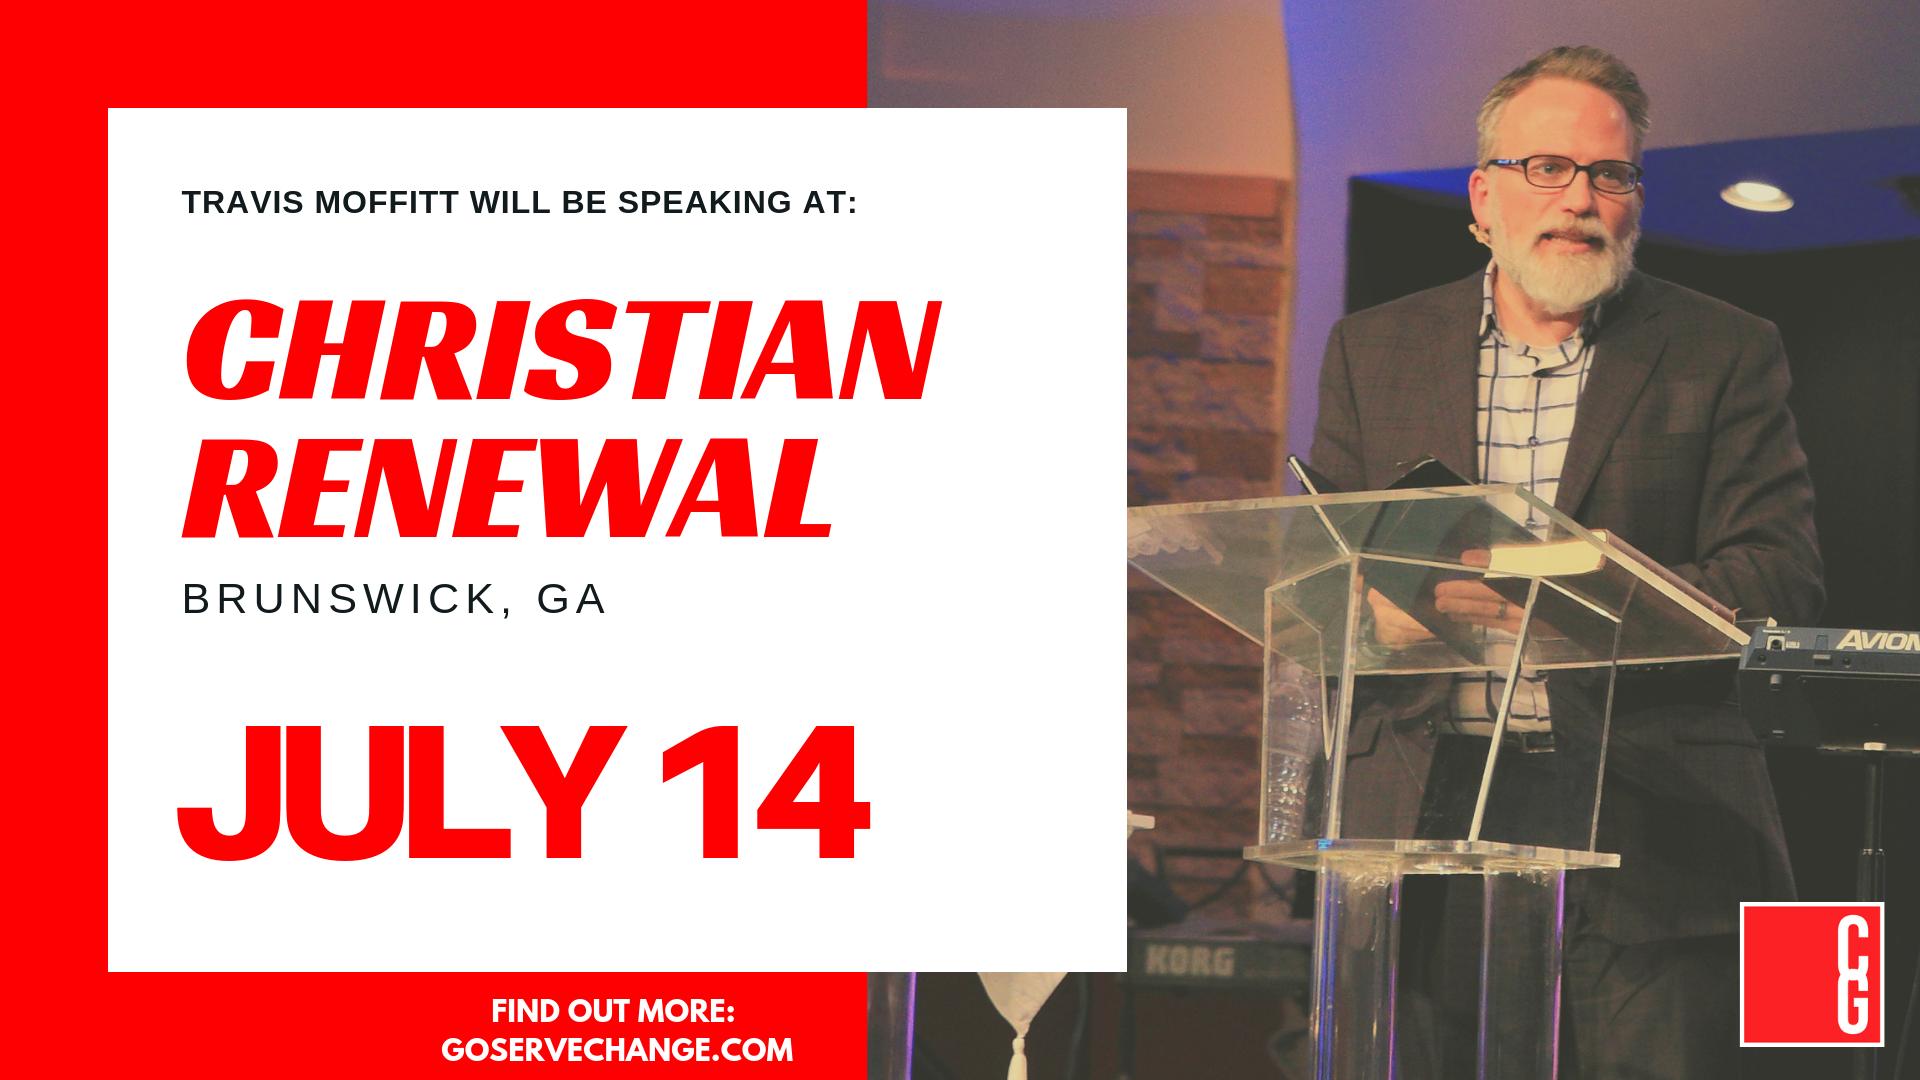 Travis Moffitt will be speaking at Christian Renewal Church in Brunswick GA.png